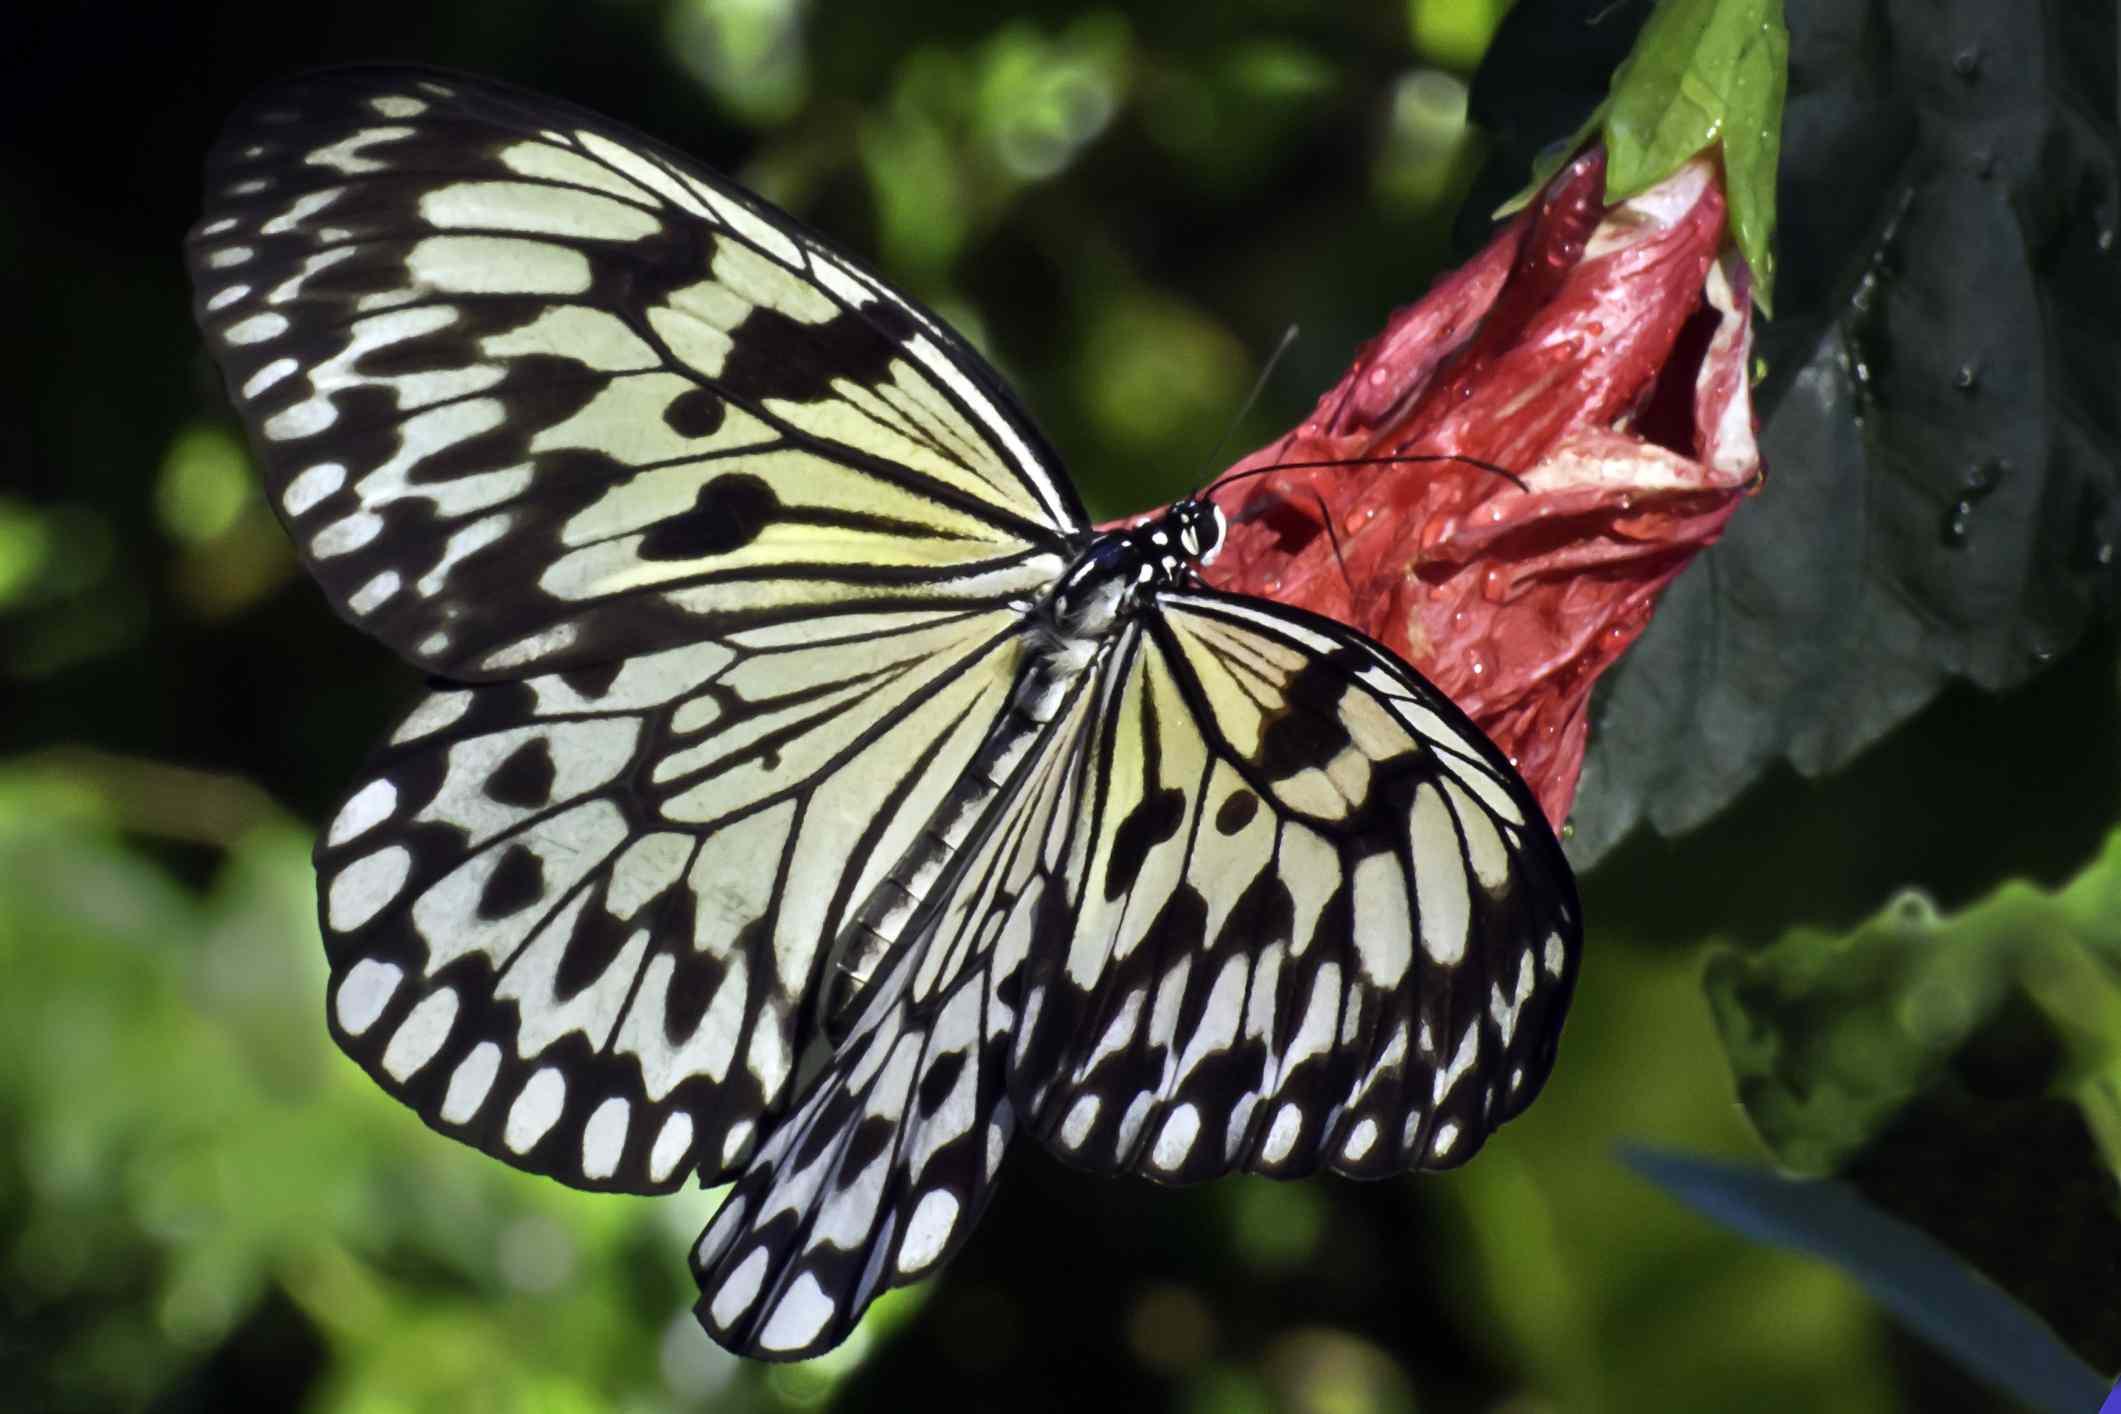 black and white Tree Nymph (Idea Leuconoe) at the Aruba Butterfly Farm